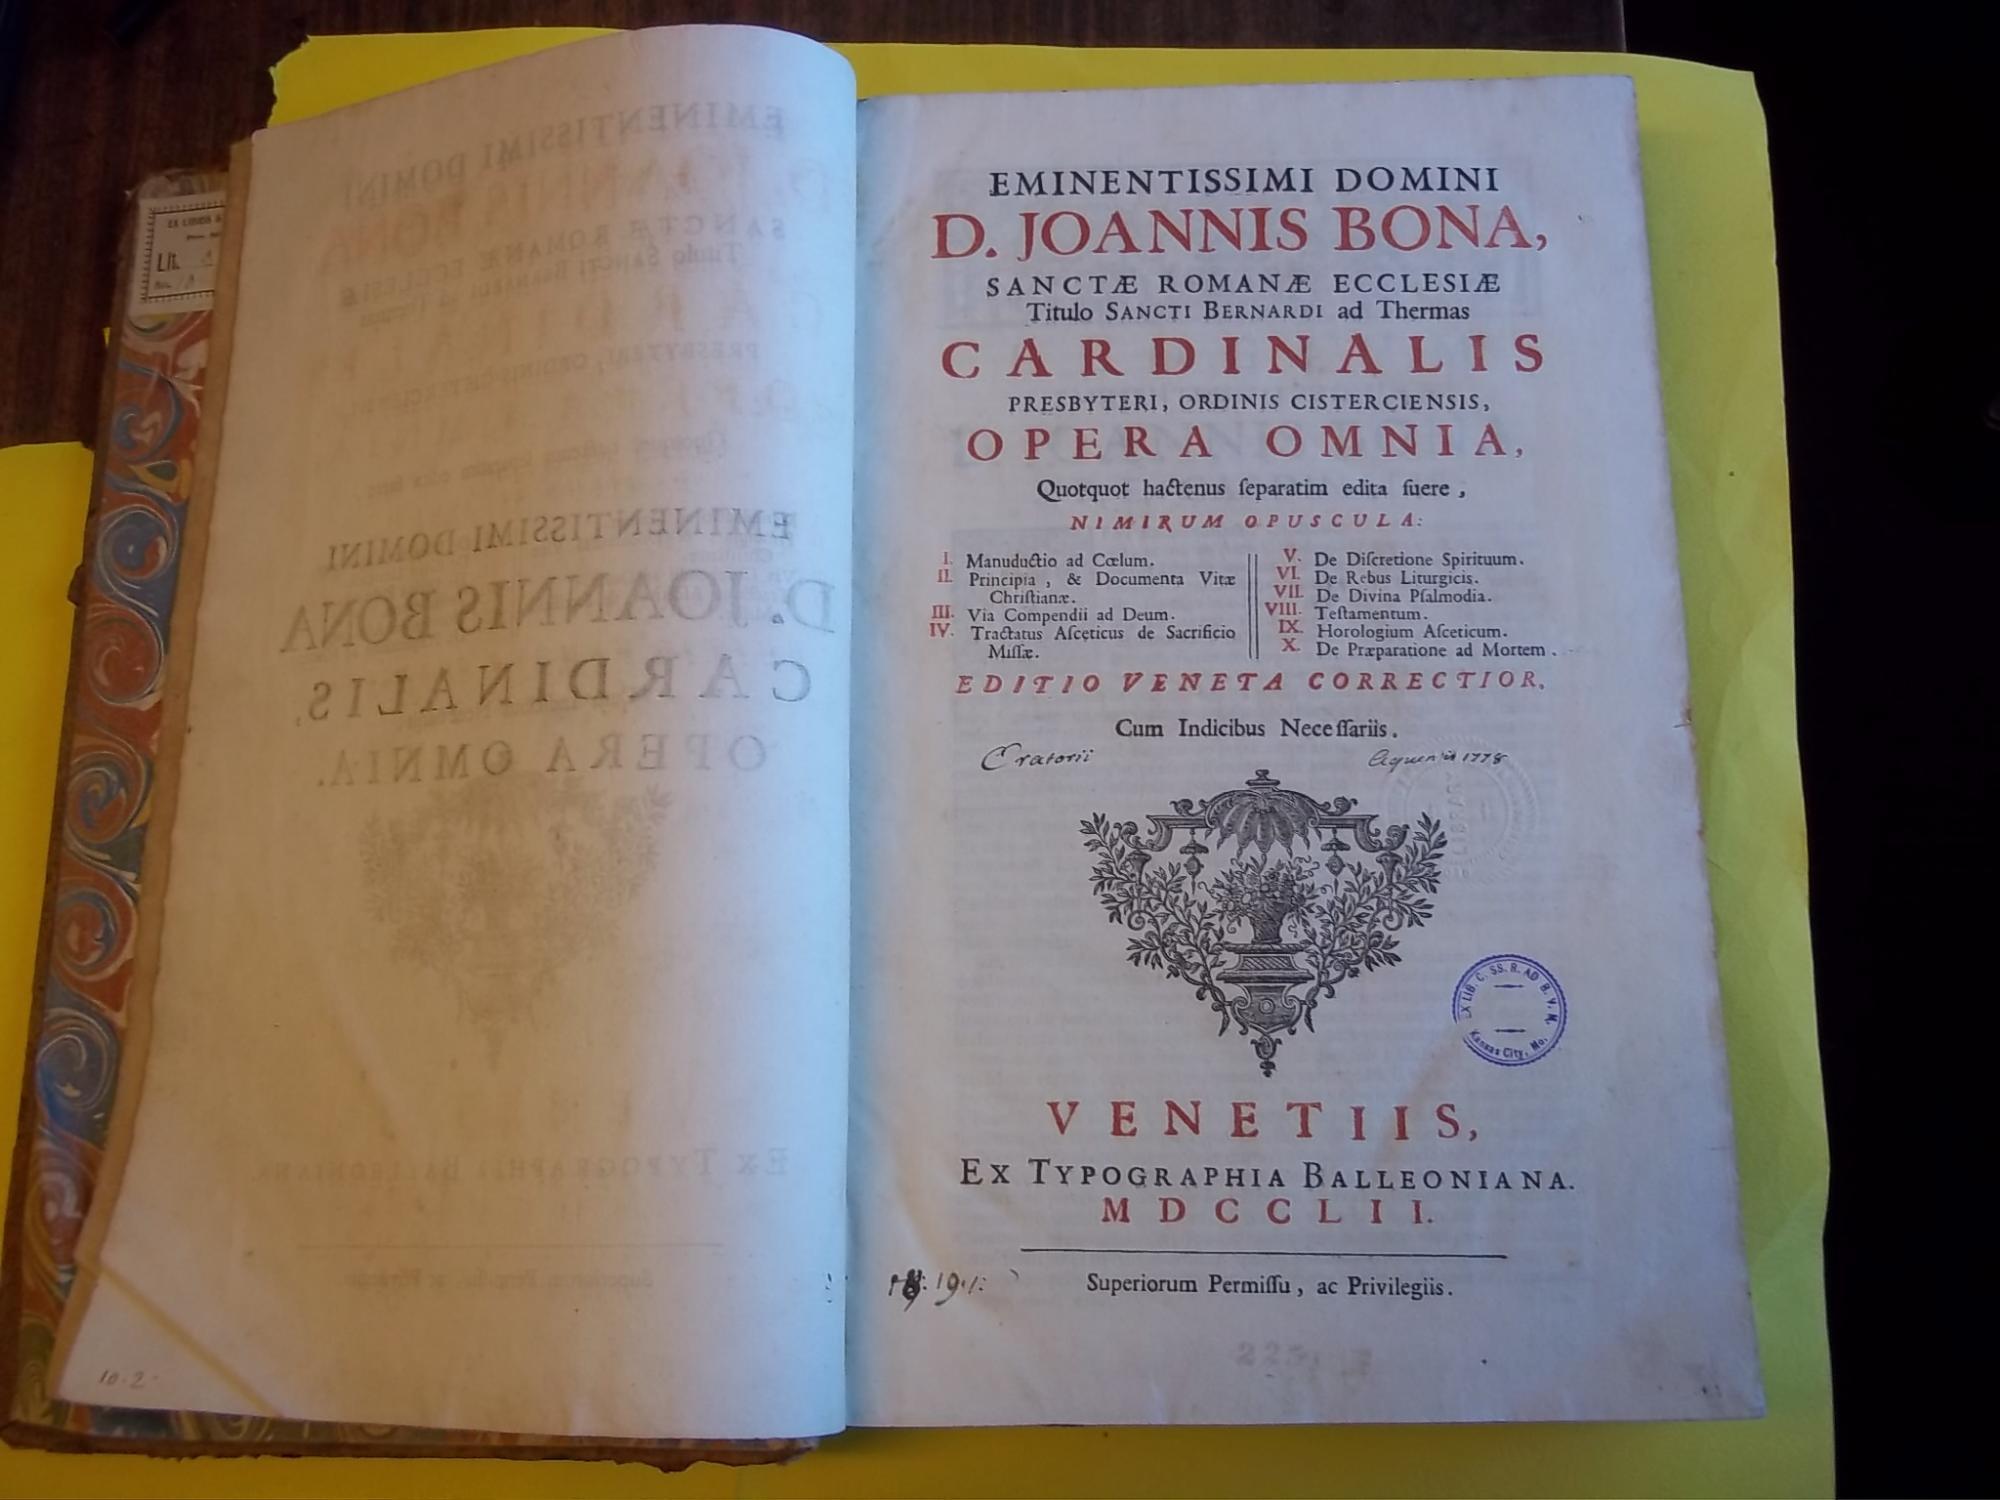 Eminentissimi domini D. Joannis Bona Opera omnia, quotquot ...